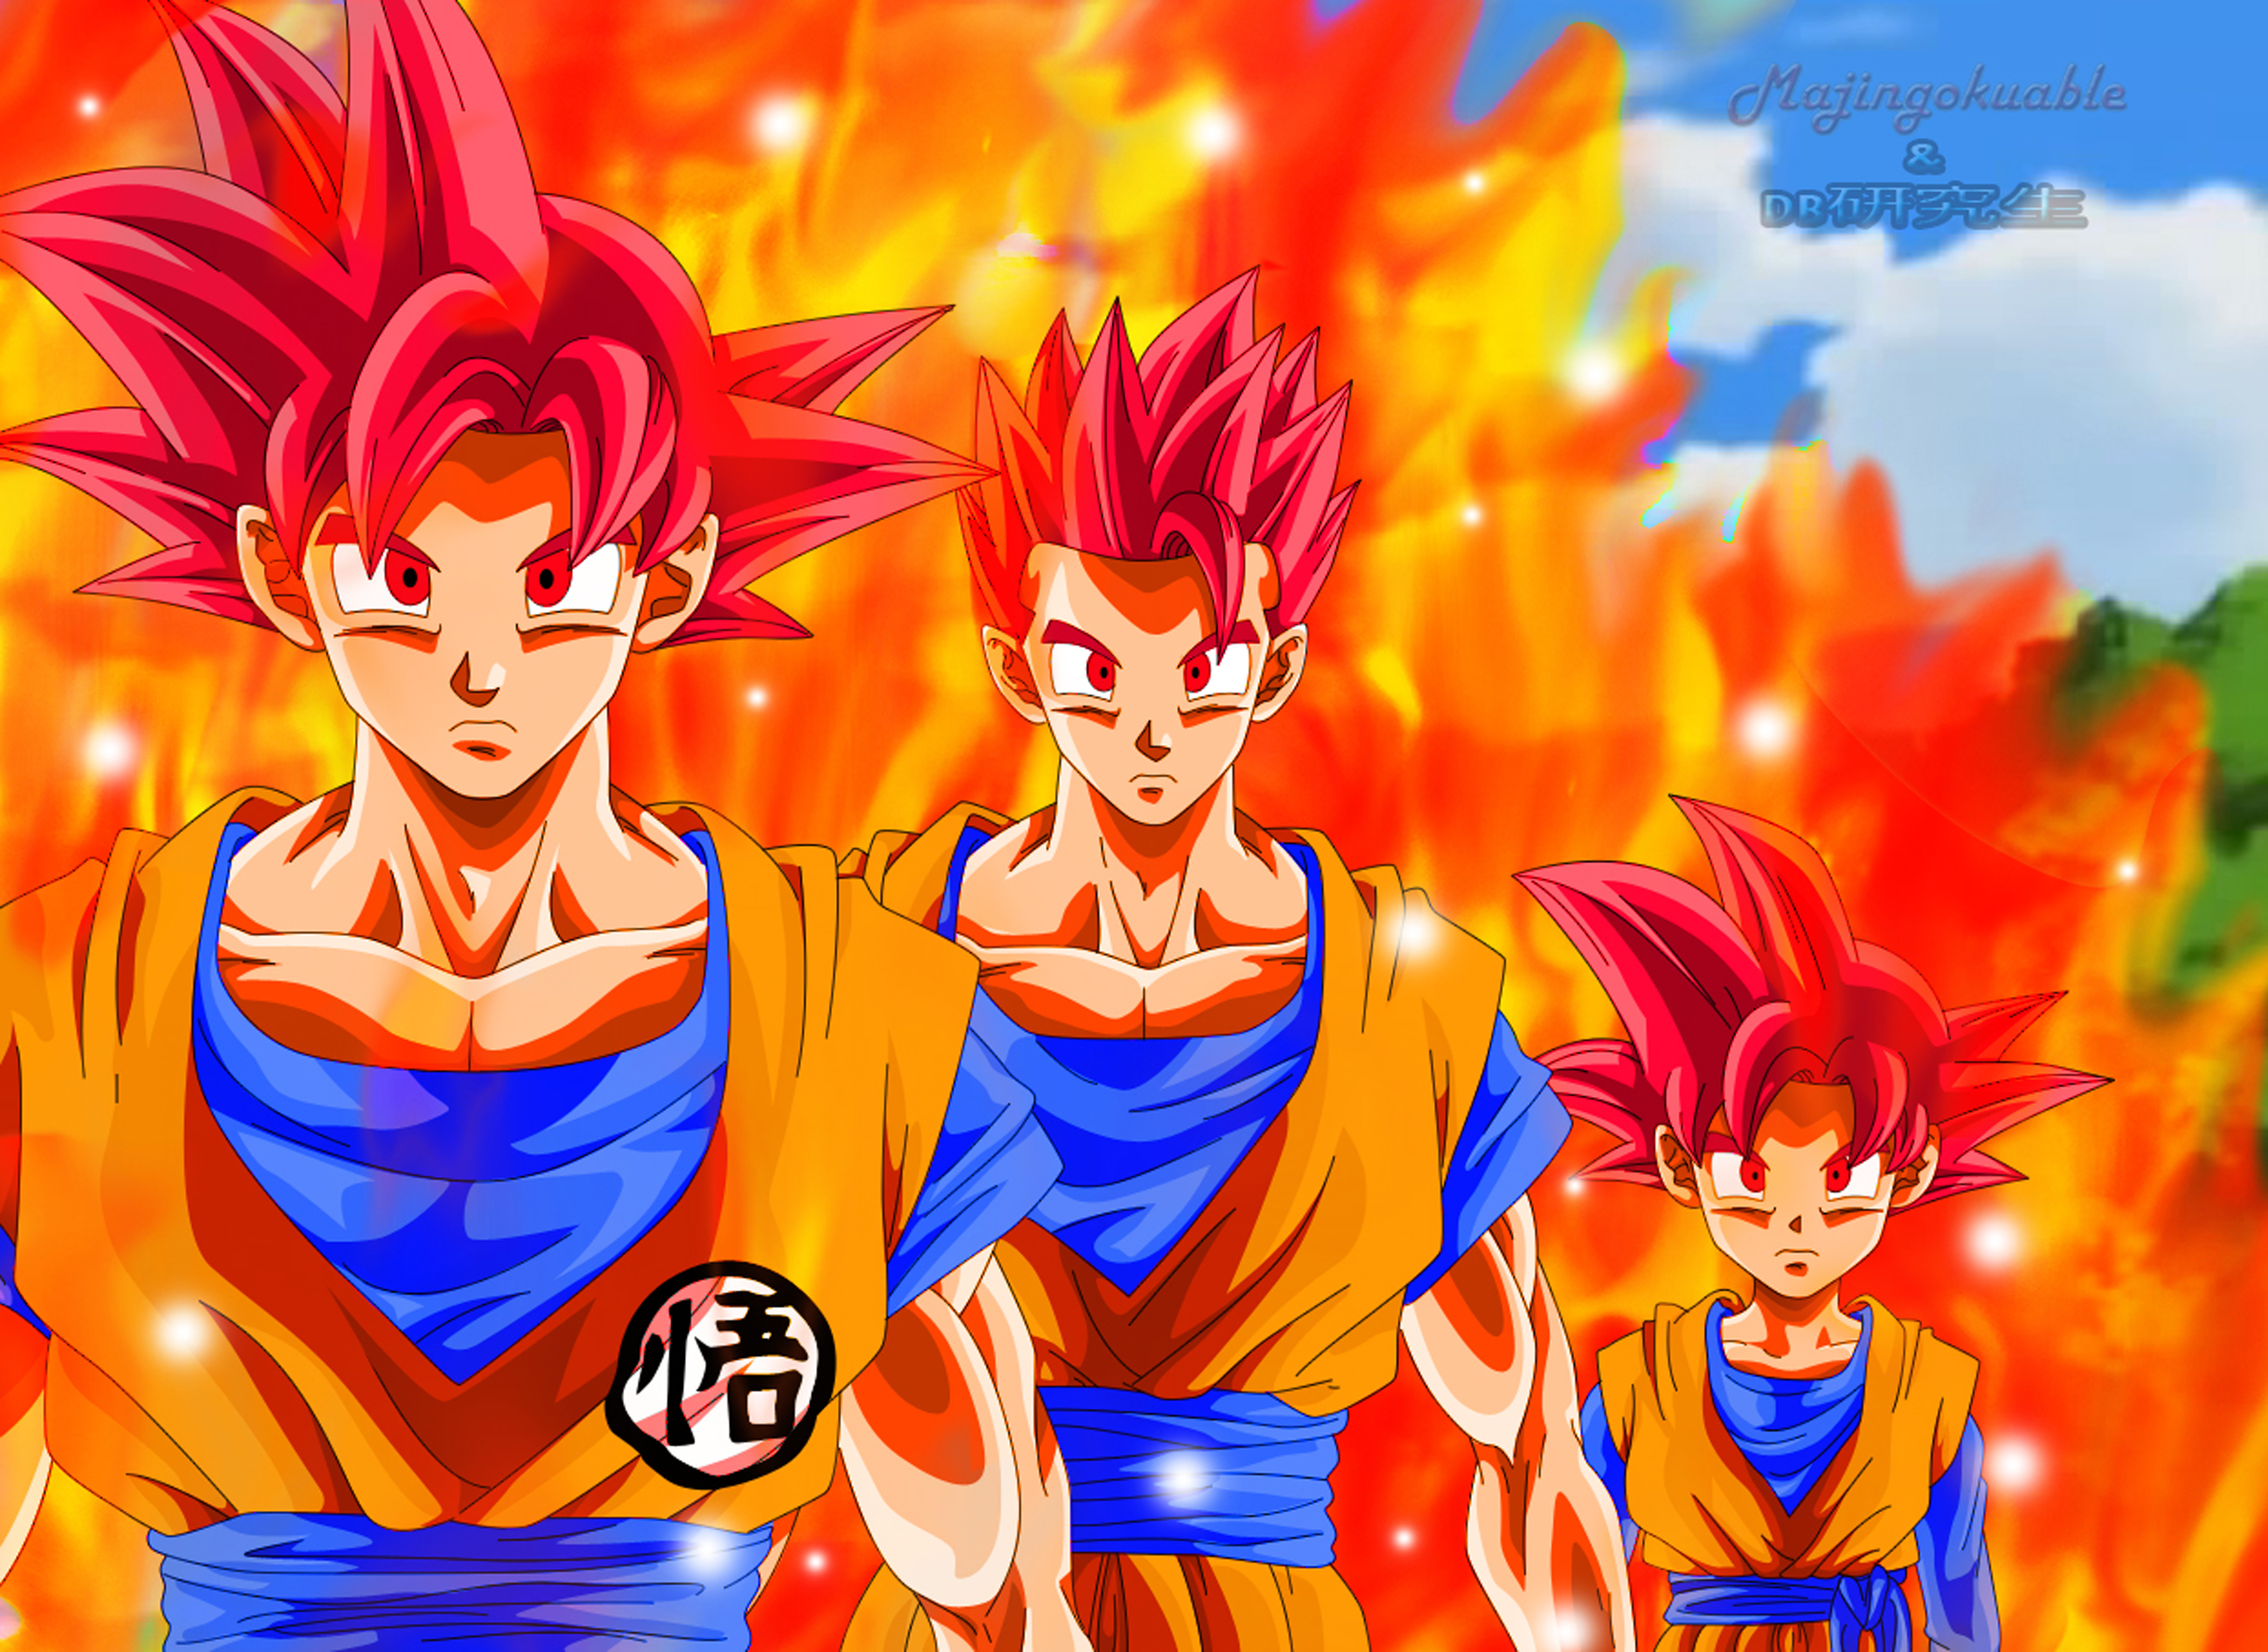 Goku, Gohan y Goten ssj Dios by Majingokuable on DeviantArt